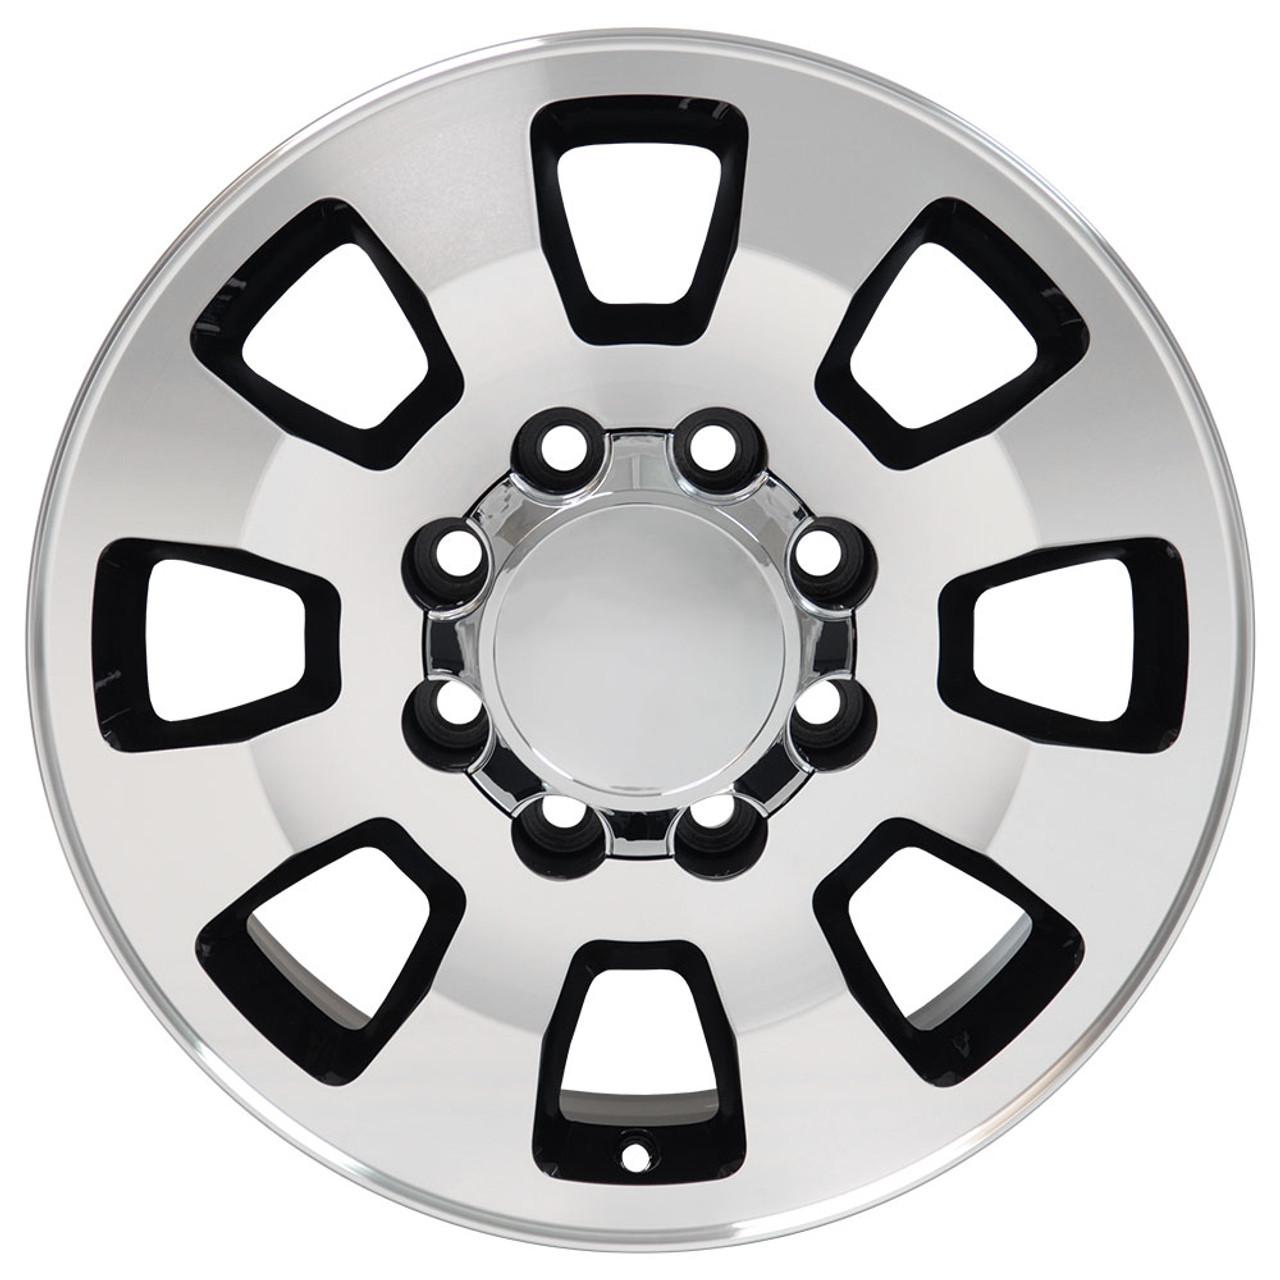 wheel face silverado chevrolet set wheels accessories black of bmf machined fits gmc rims replica